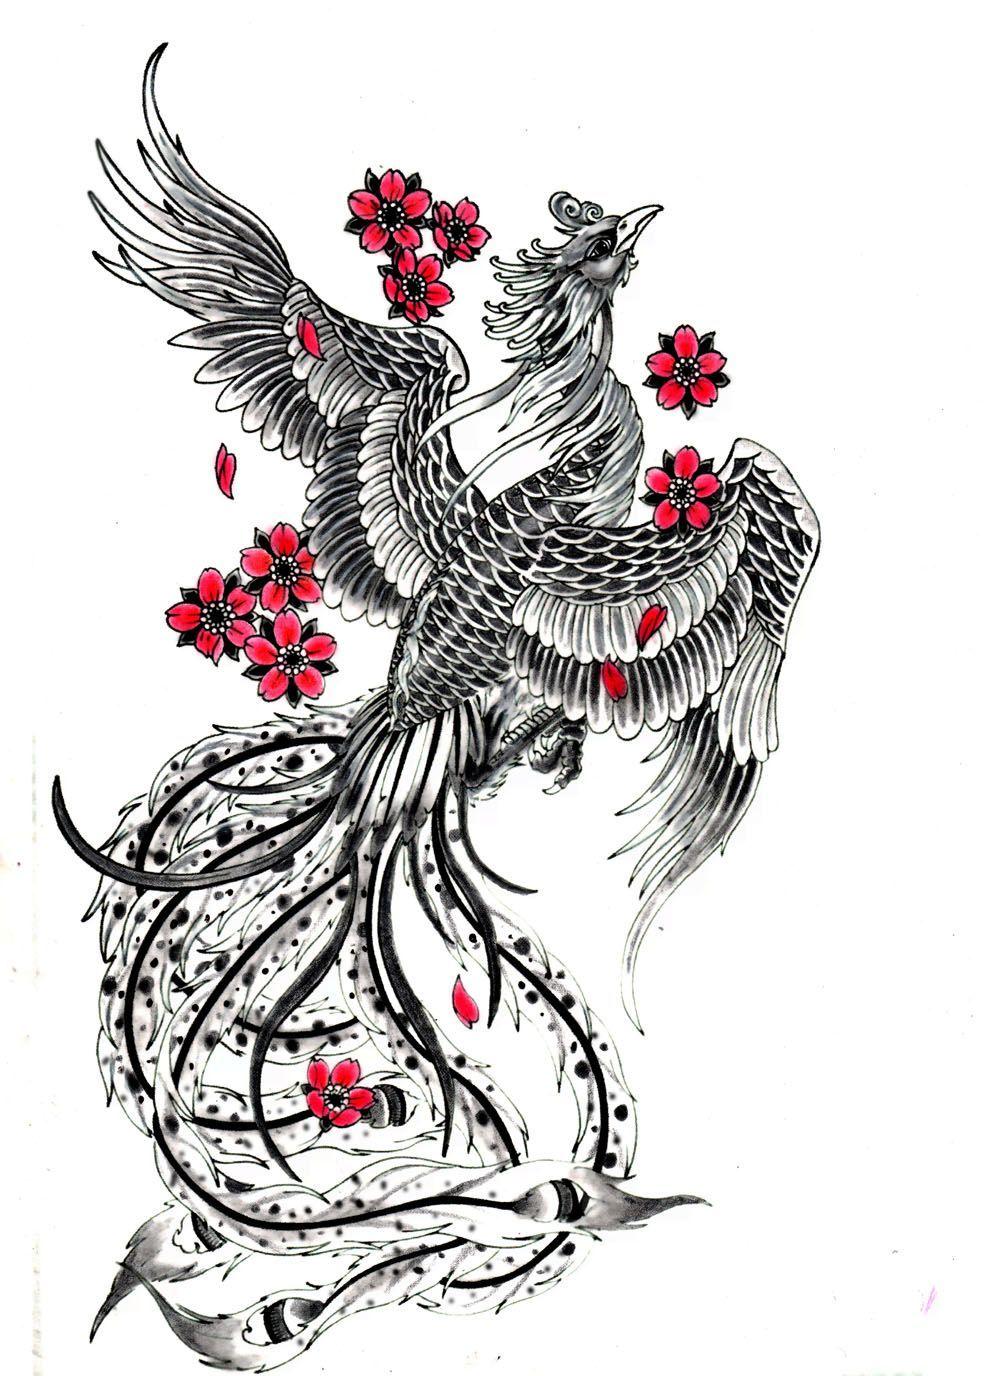 29 Amazing Phoenix Tattoo Ideas You Will Enjoy In 2020 Phoenix Tattoo Tattoos Phoenix Tattoo Design